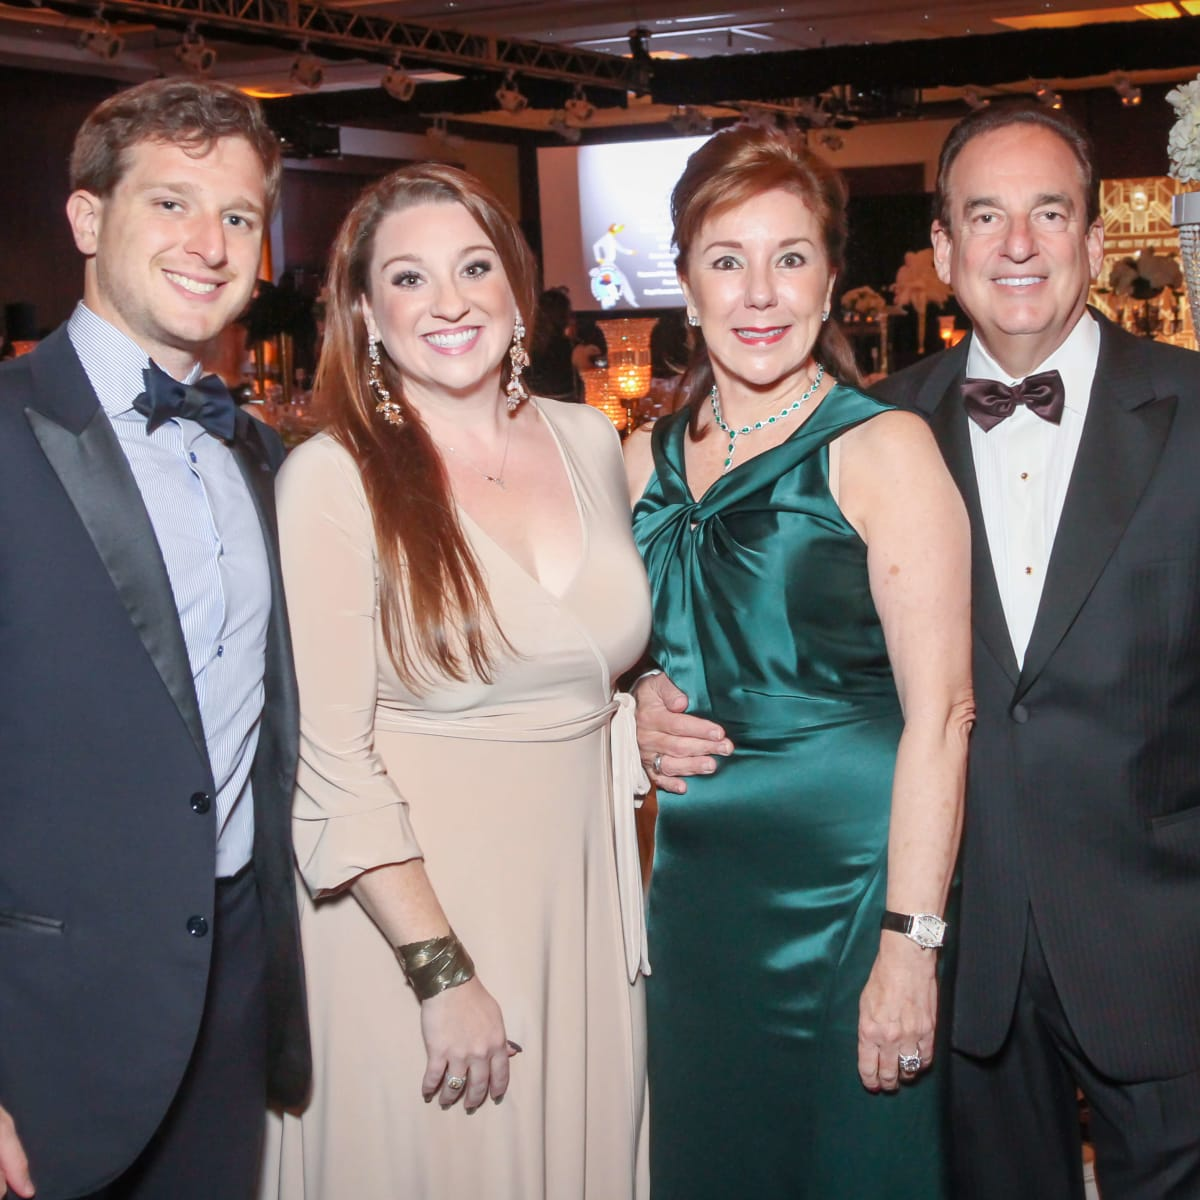 Jacob, Laura, Elizabeth and Alan Stein